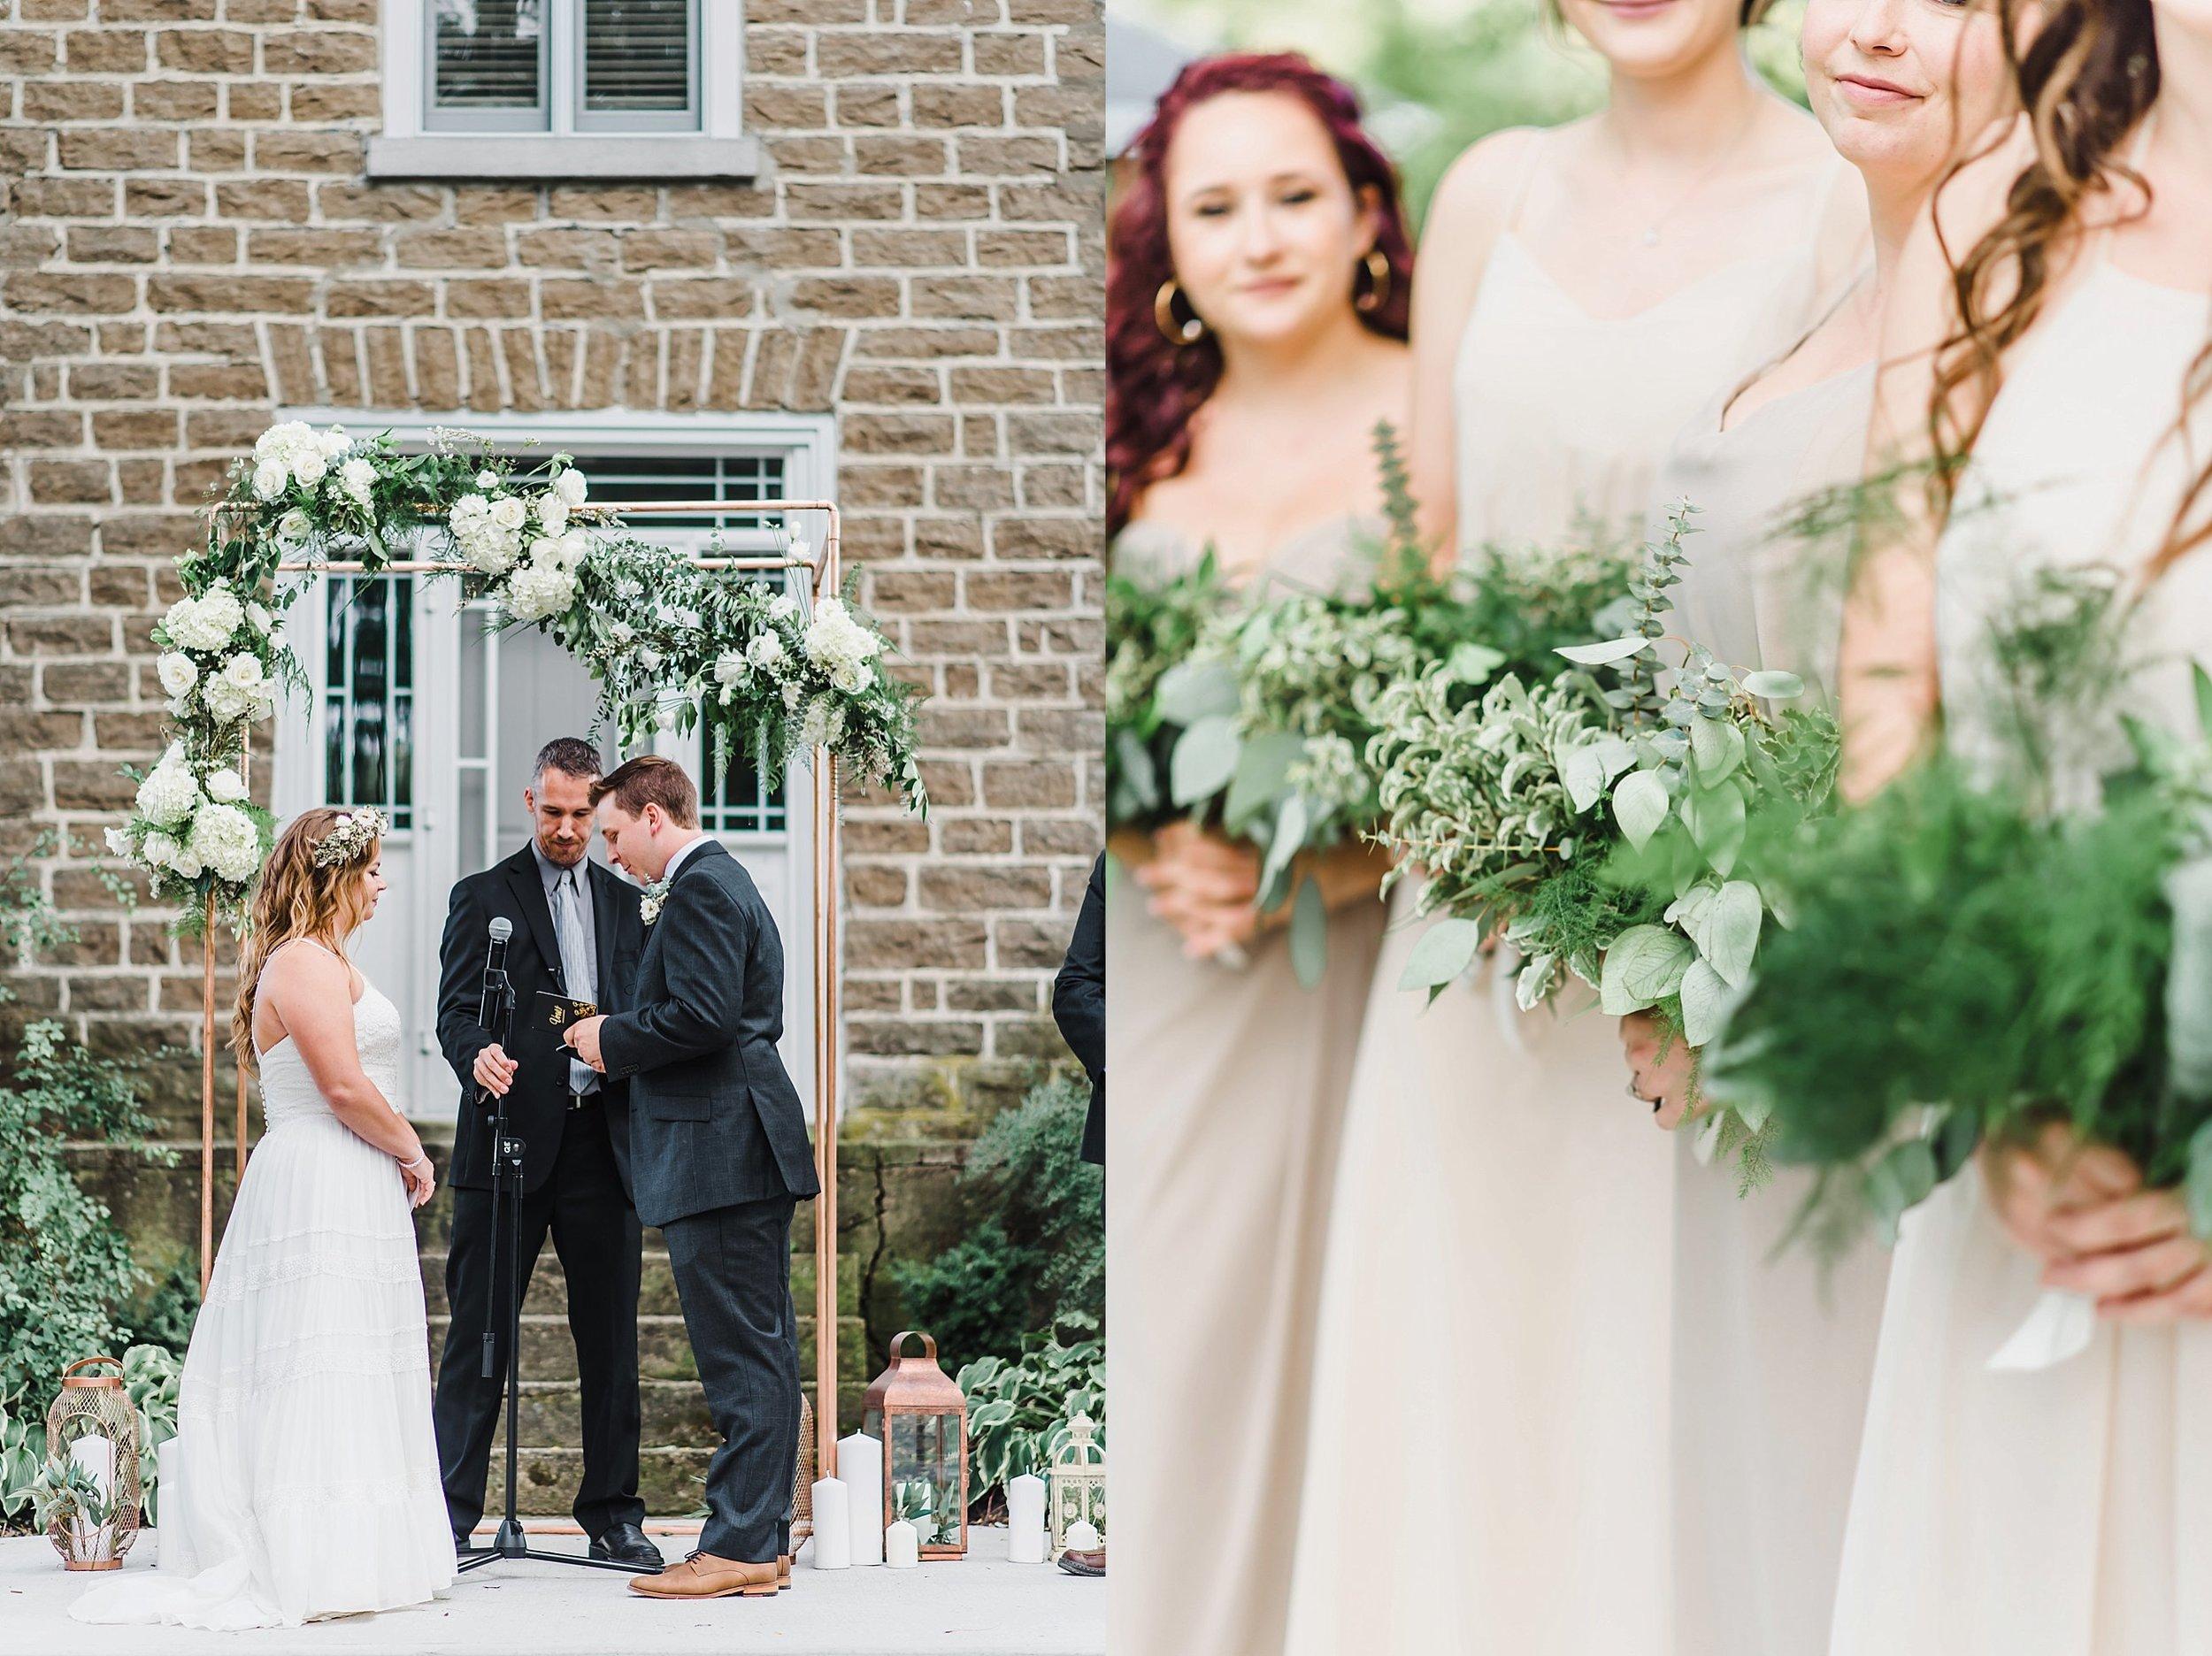 light airy indie fine art ottawa wedding photographer | Ali and Batoul Photography_1156.jpg